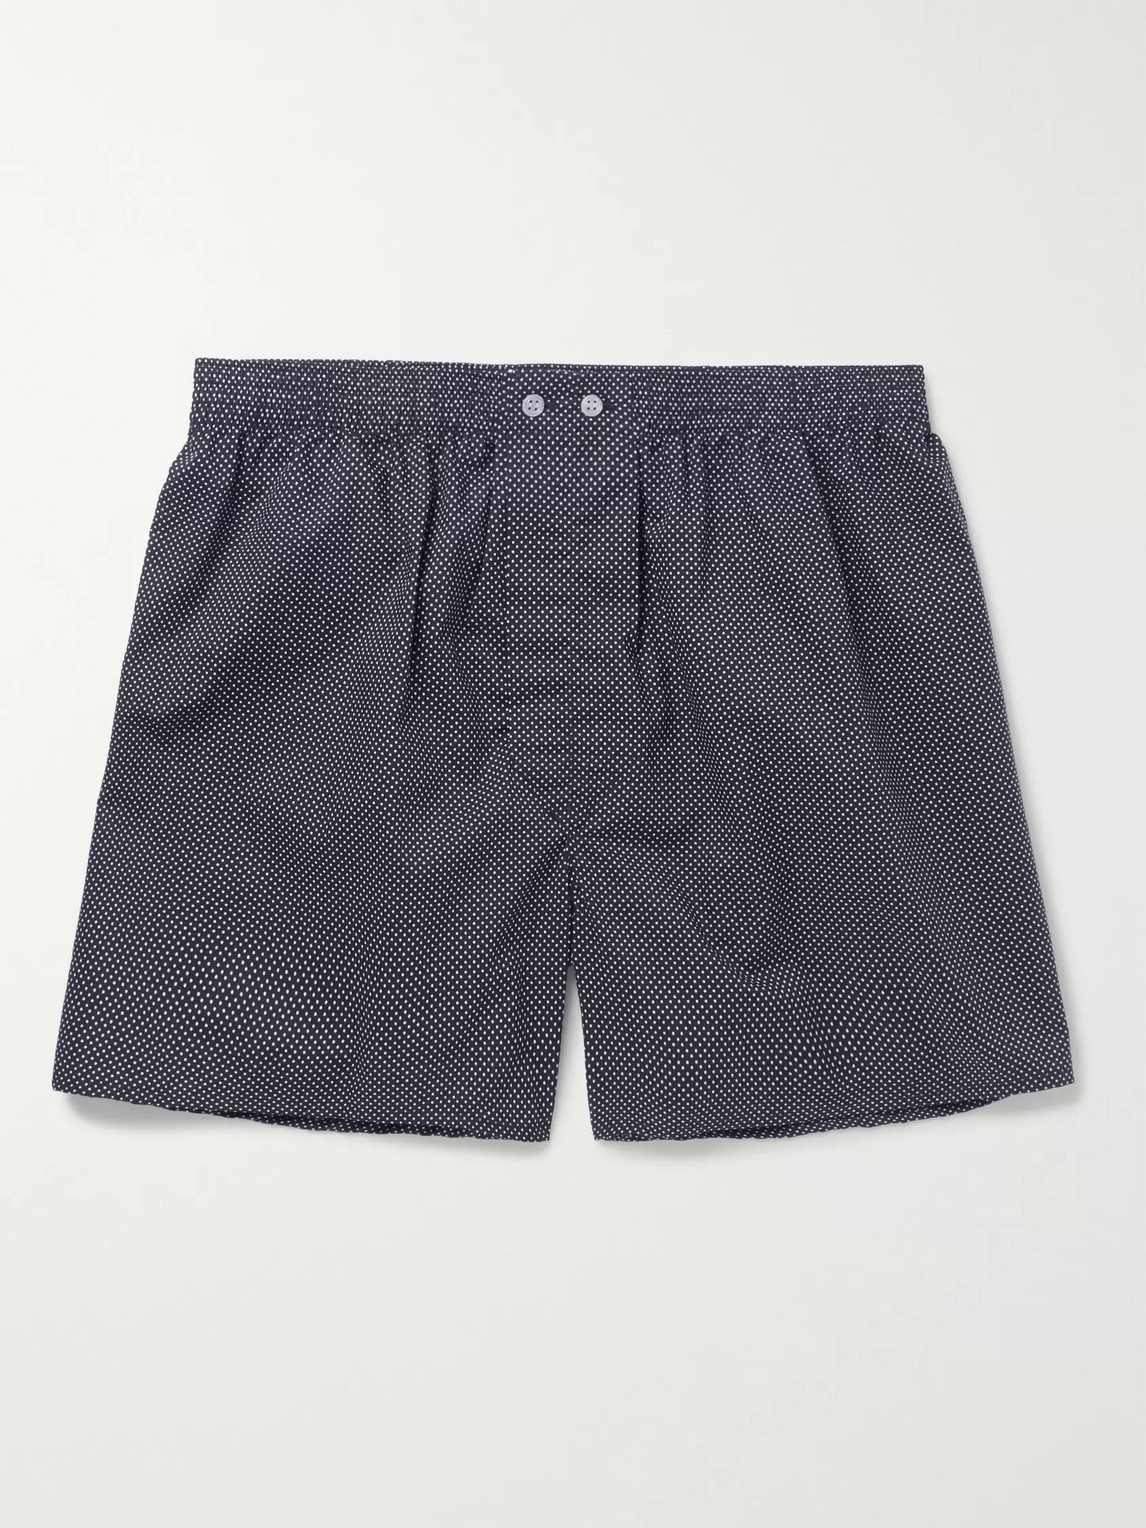 derek rose - plaza polka-dot cotton boxer shorts - blue